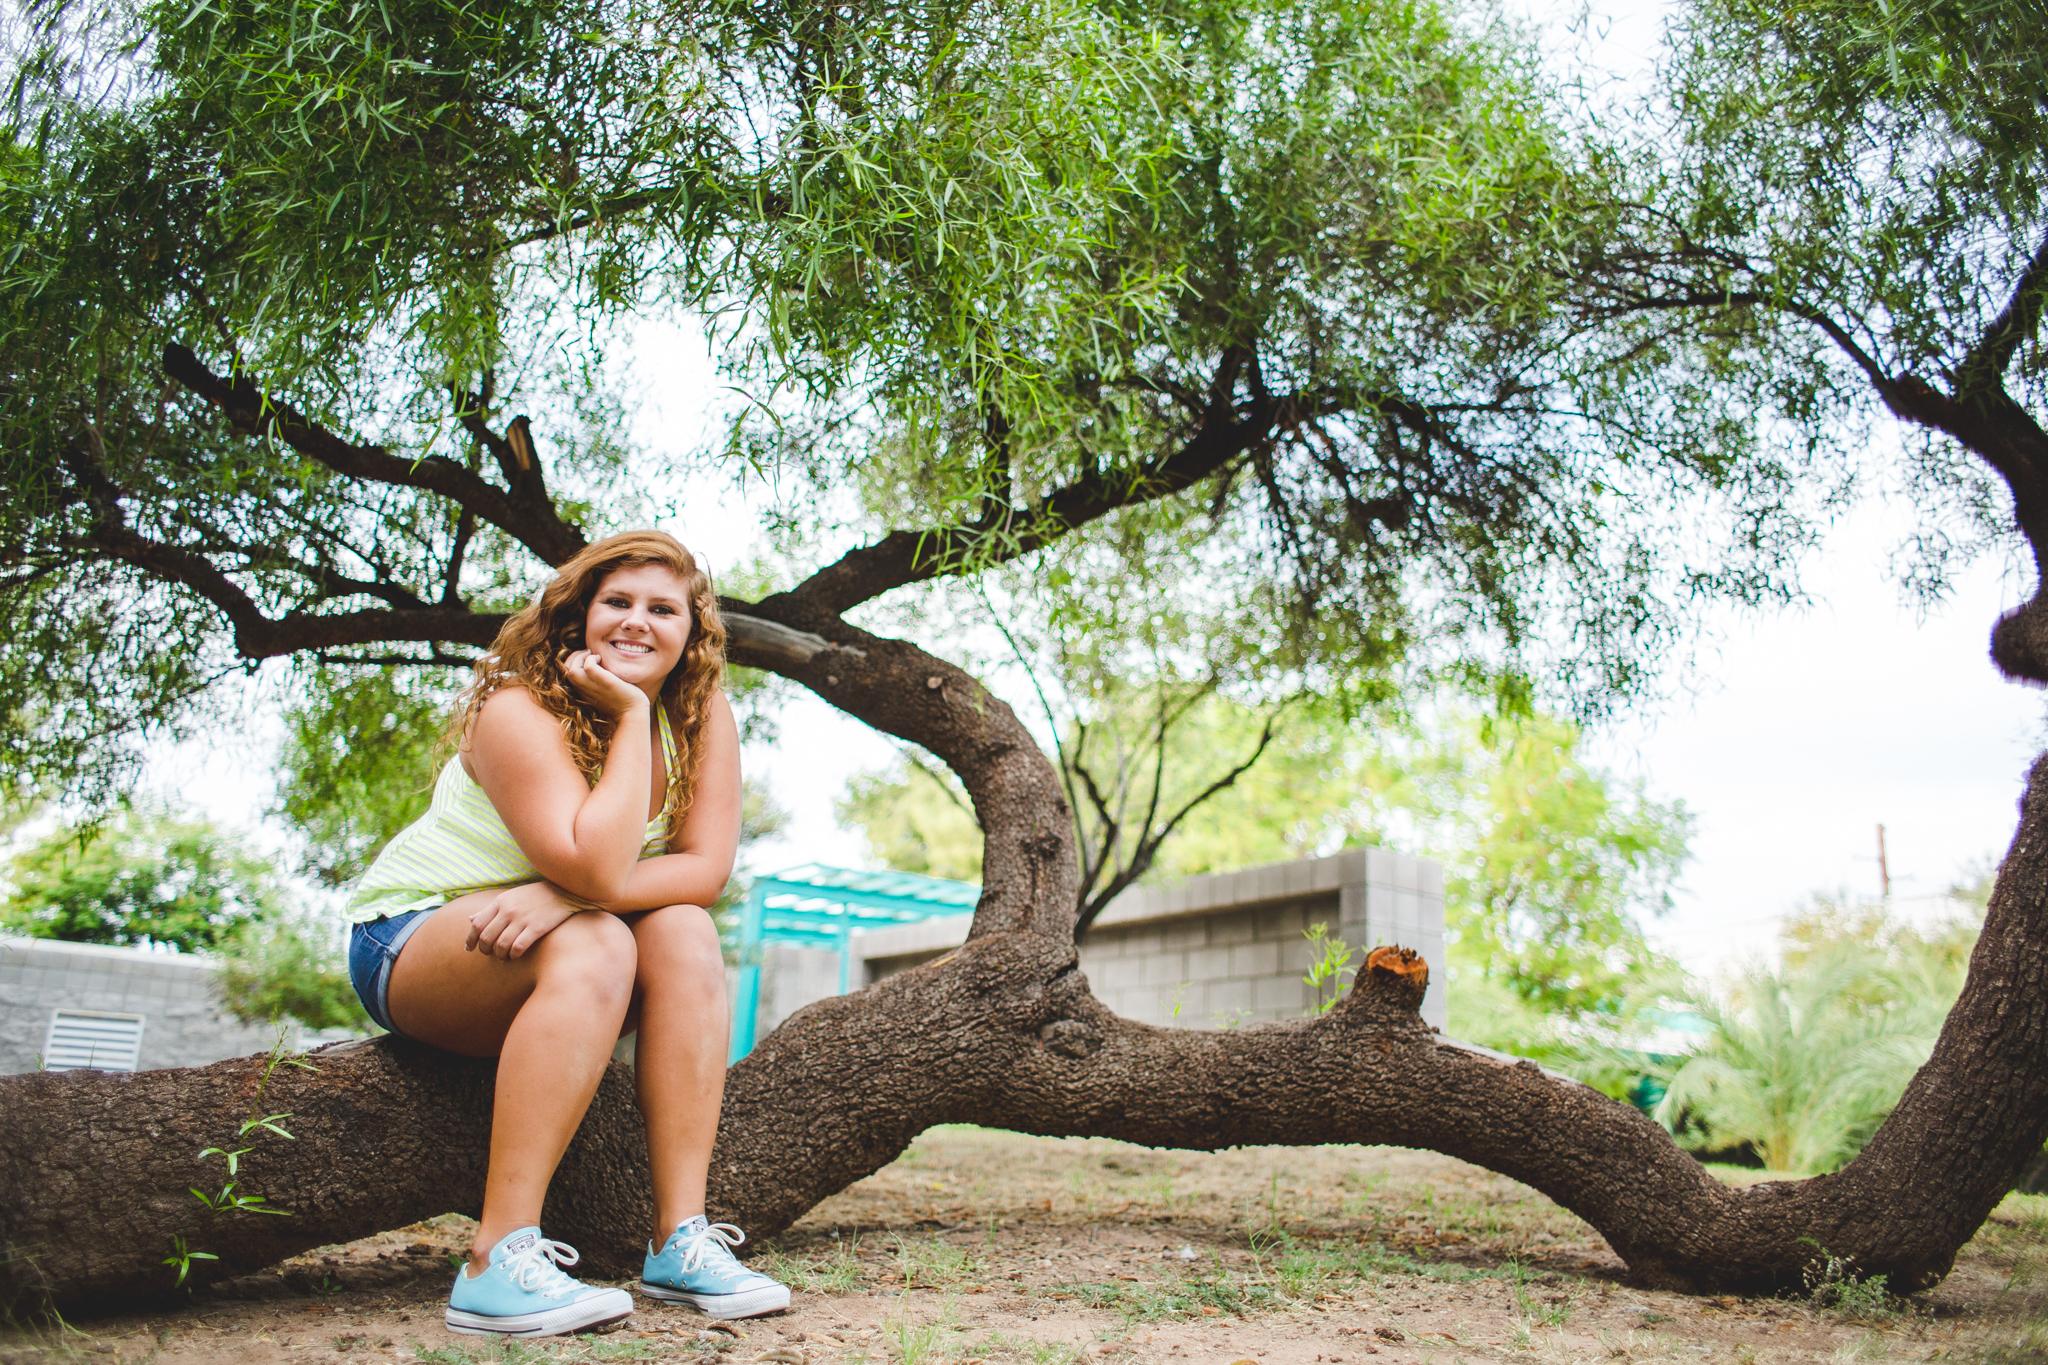 Cool Wide Angle Senior Photo Marissa Sits on Tree